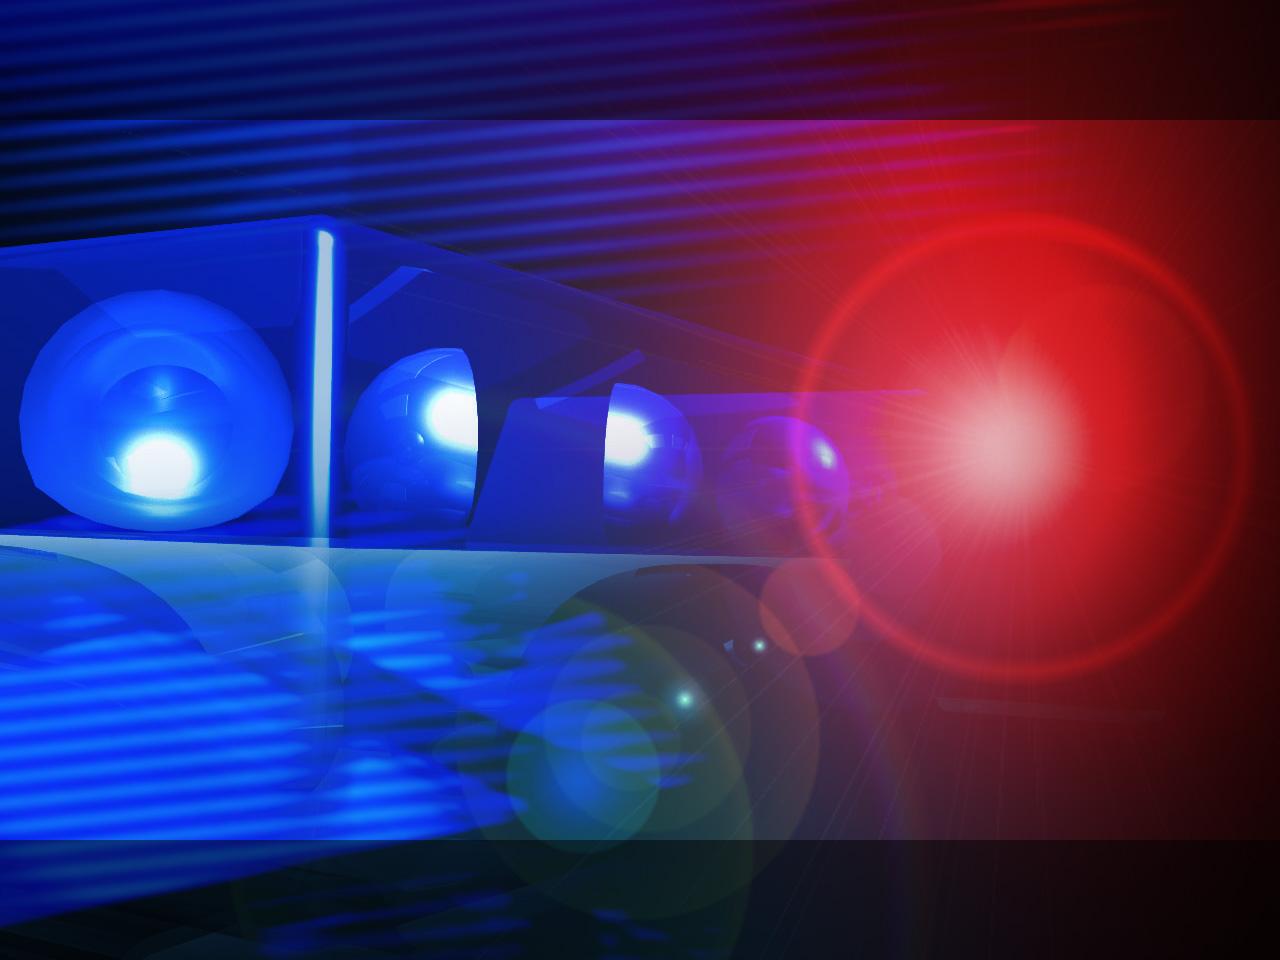 Burlington County, NJ - Bill Targets Misuse Of Emergency Lights